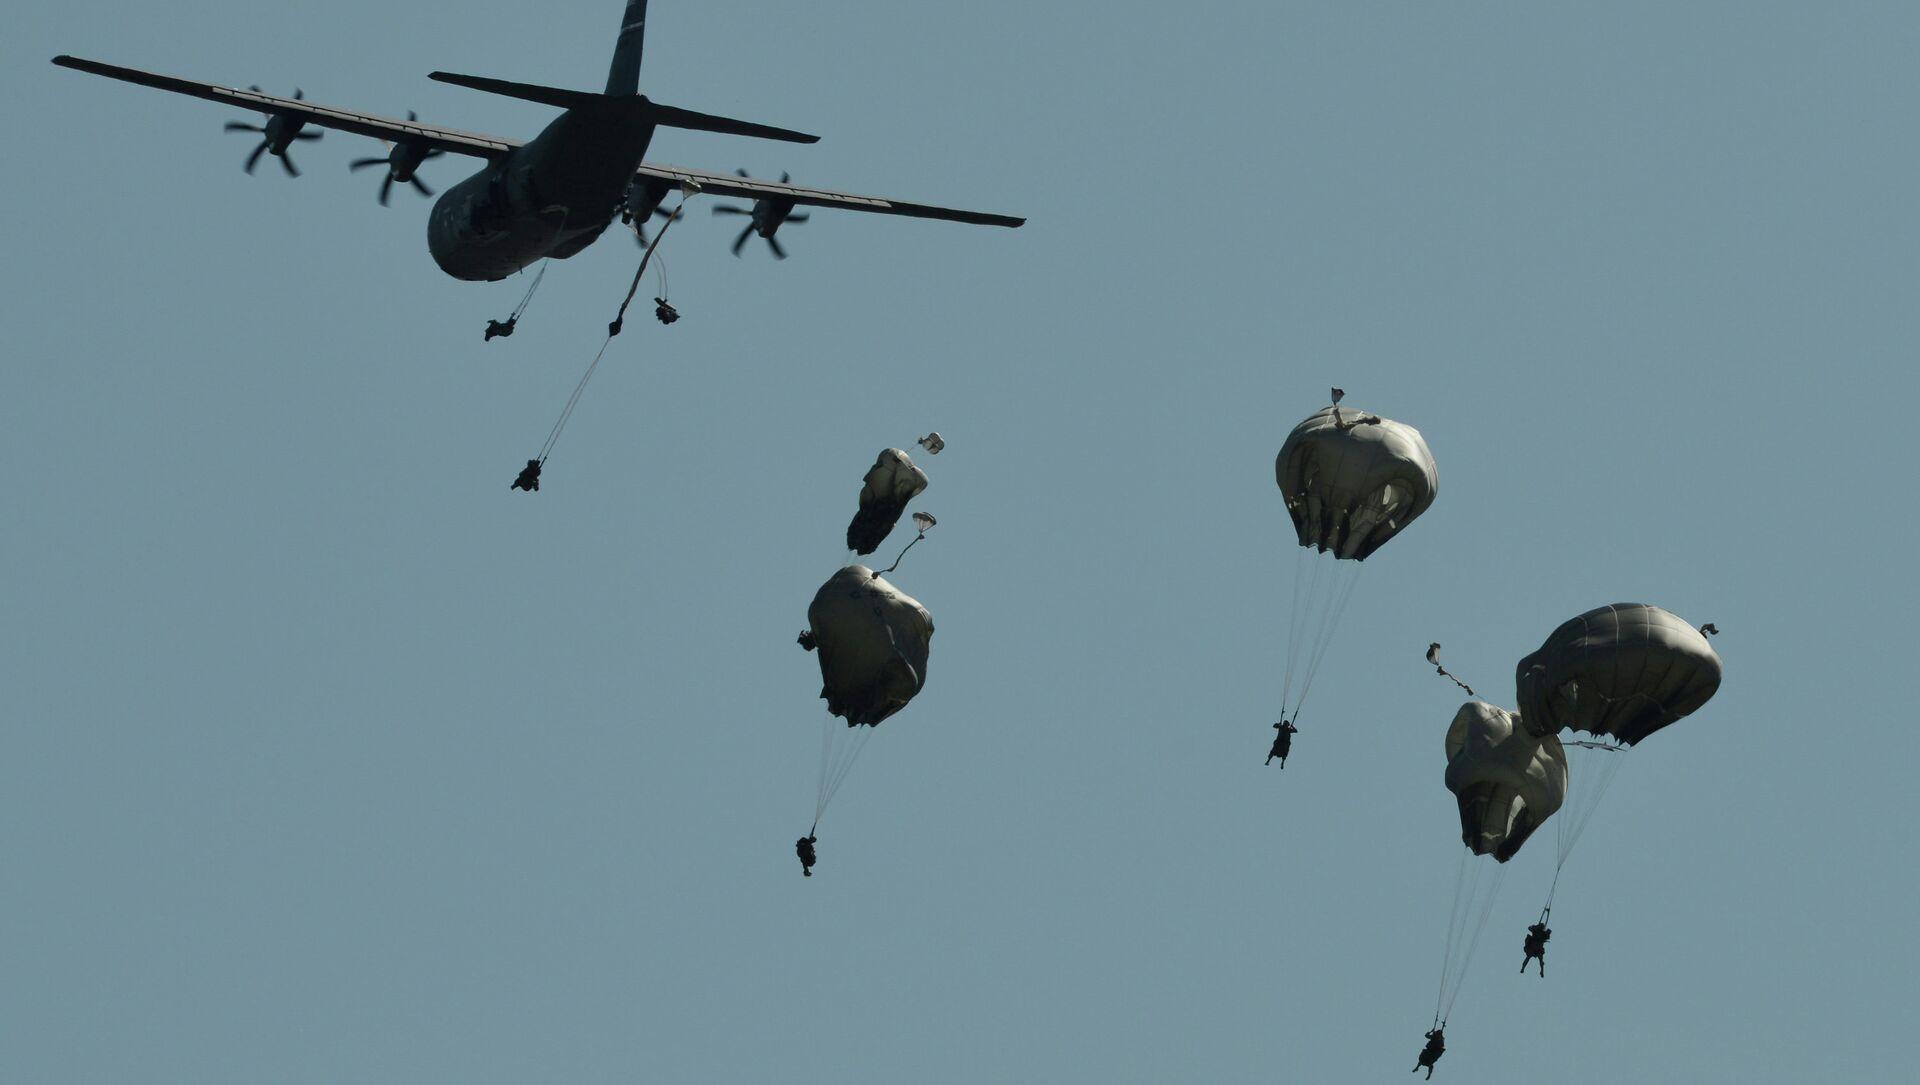 Paracadutisti durante esercitazioni NATO Swift Response in Romania - Sputnik Italia, 1920, 08.05.2021